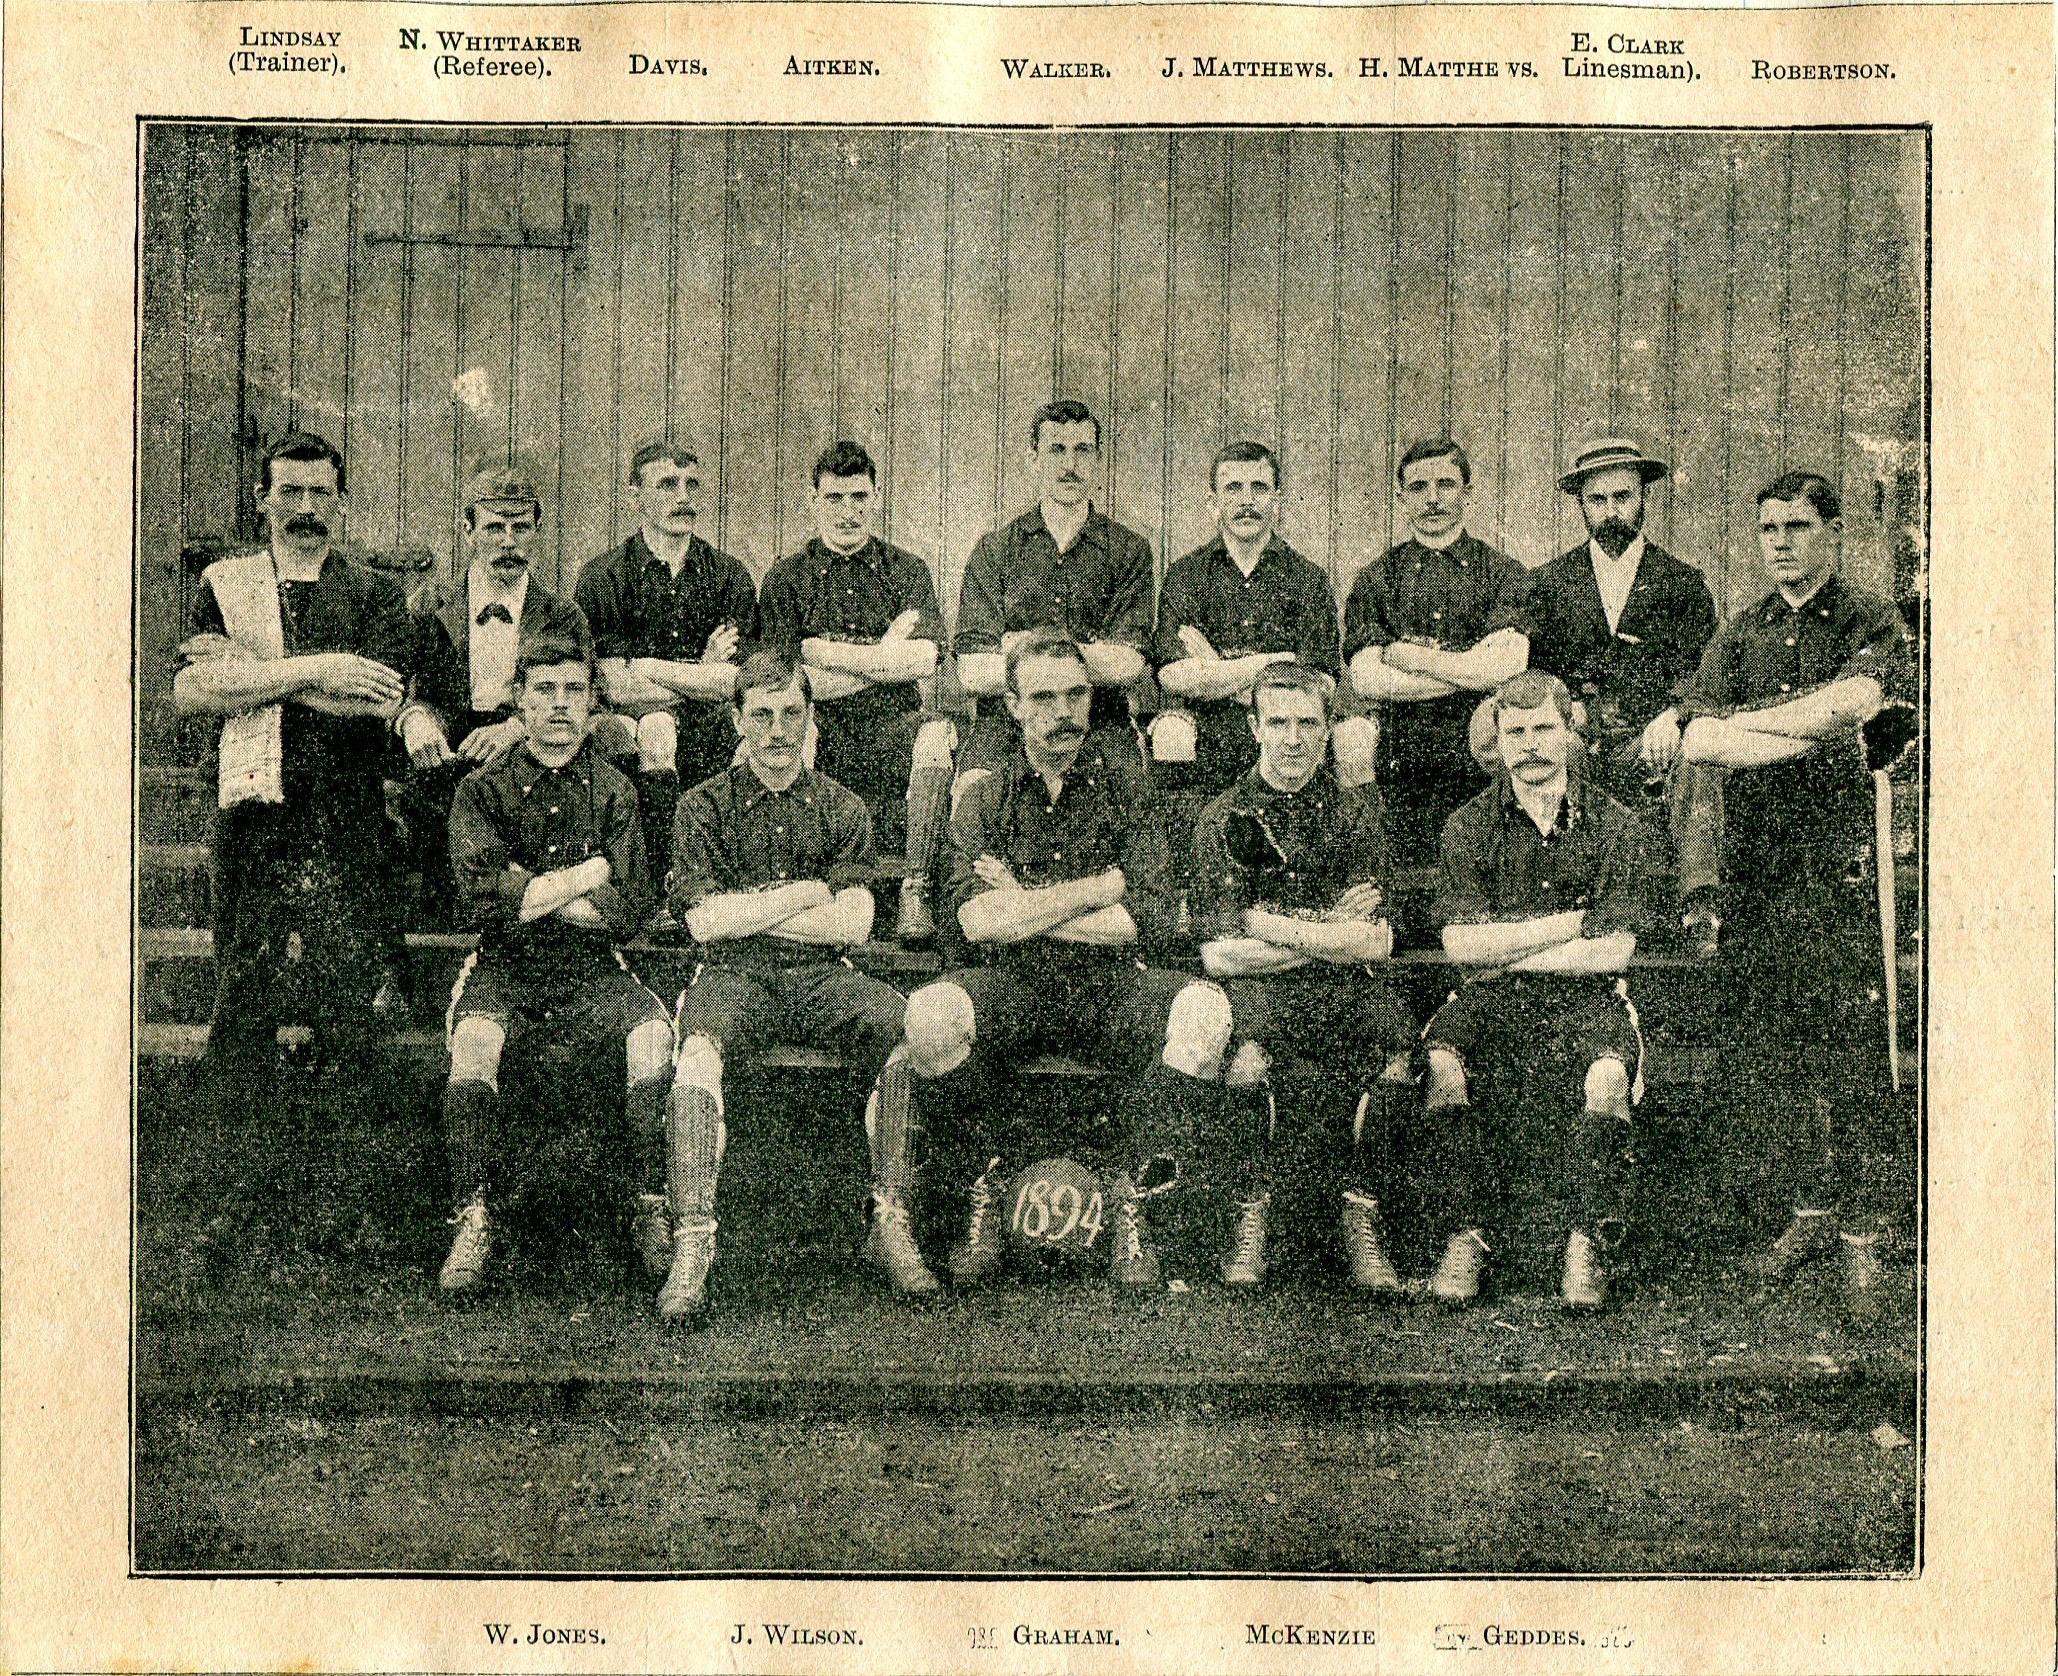 Millwall Athletic 1894